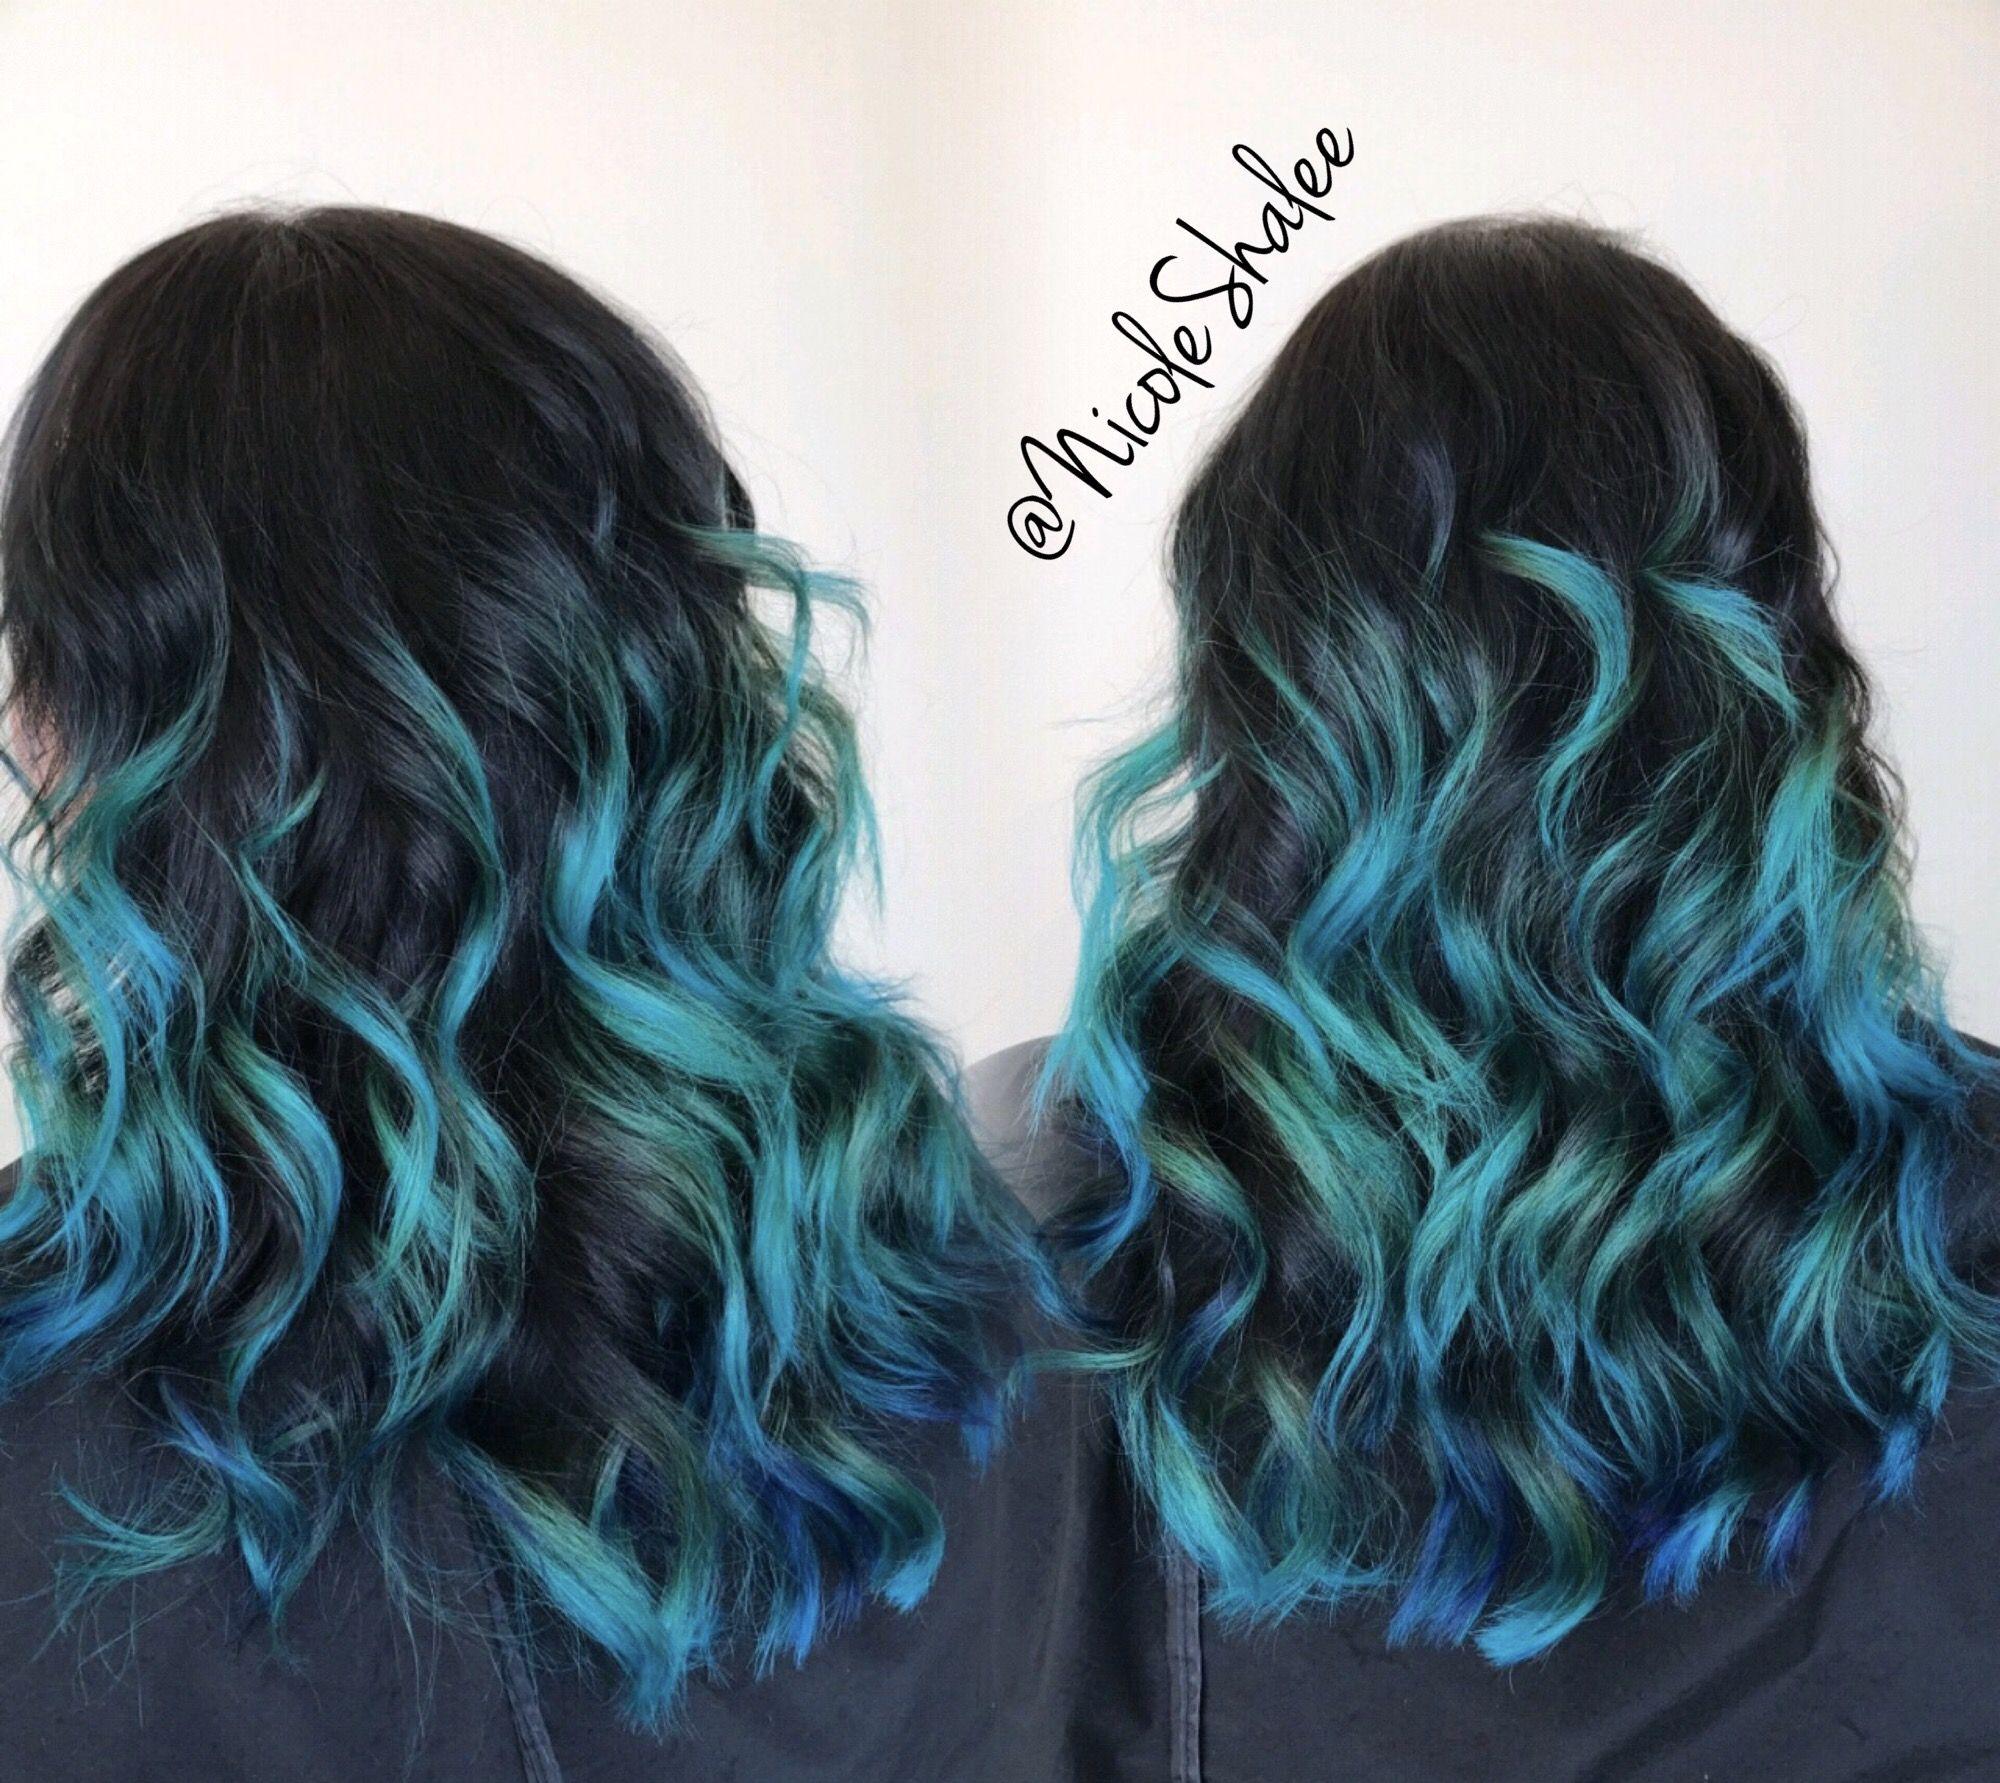 Mermaid Hair Blue Hair Teal Hair Medium Length Hair Wavy Hair